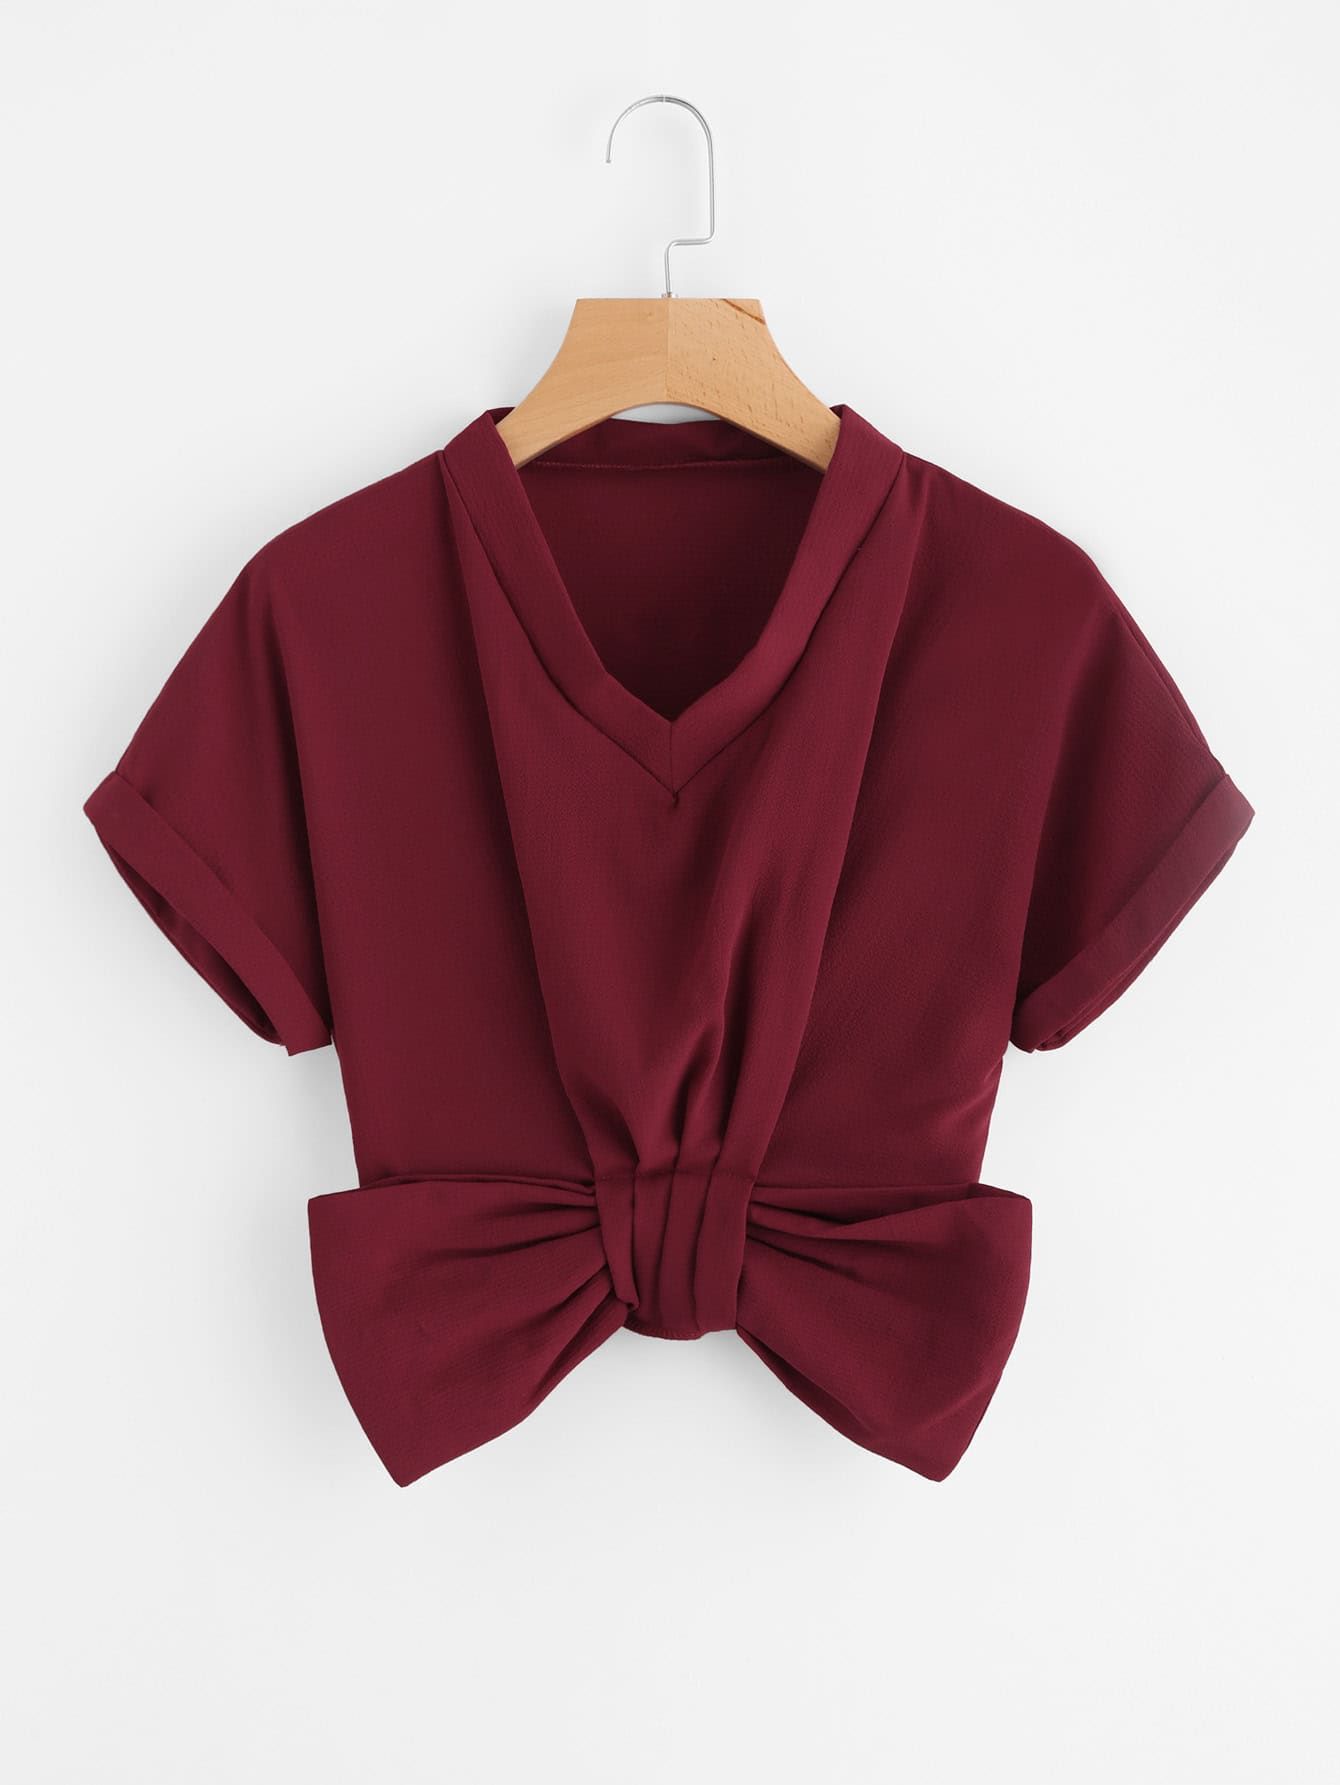 V Neckline Bow Trim Cuffed Blouse bow sleeve v neckline blouse